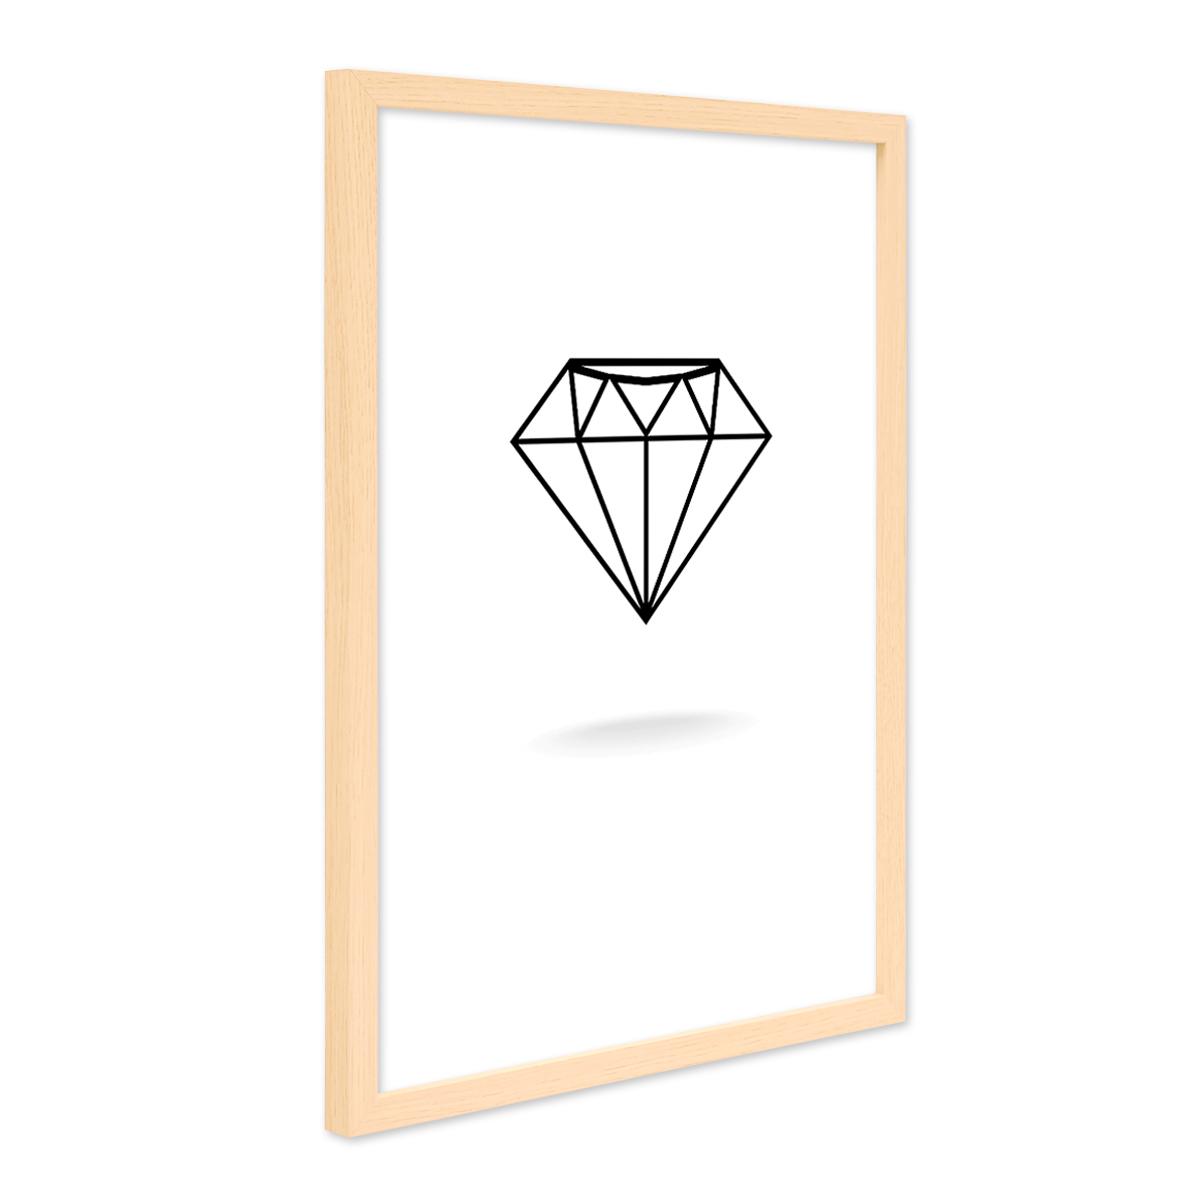 Design-Poster mit Bilderrahmen Natur \'Diamant\' 30x40 cm schwarz ...